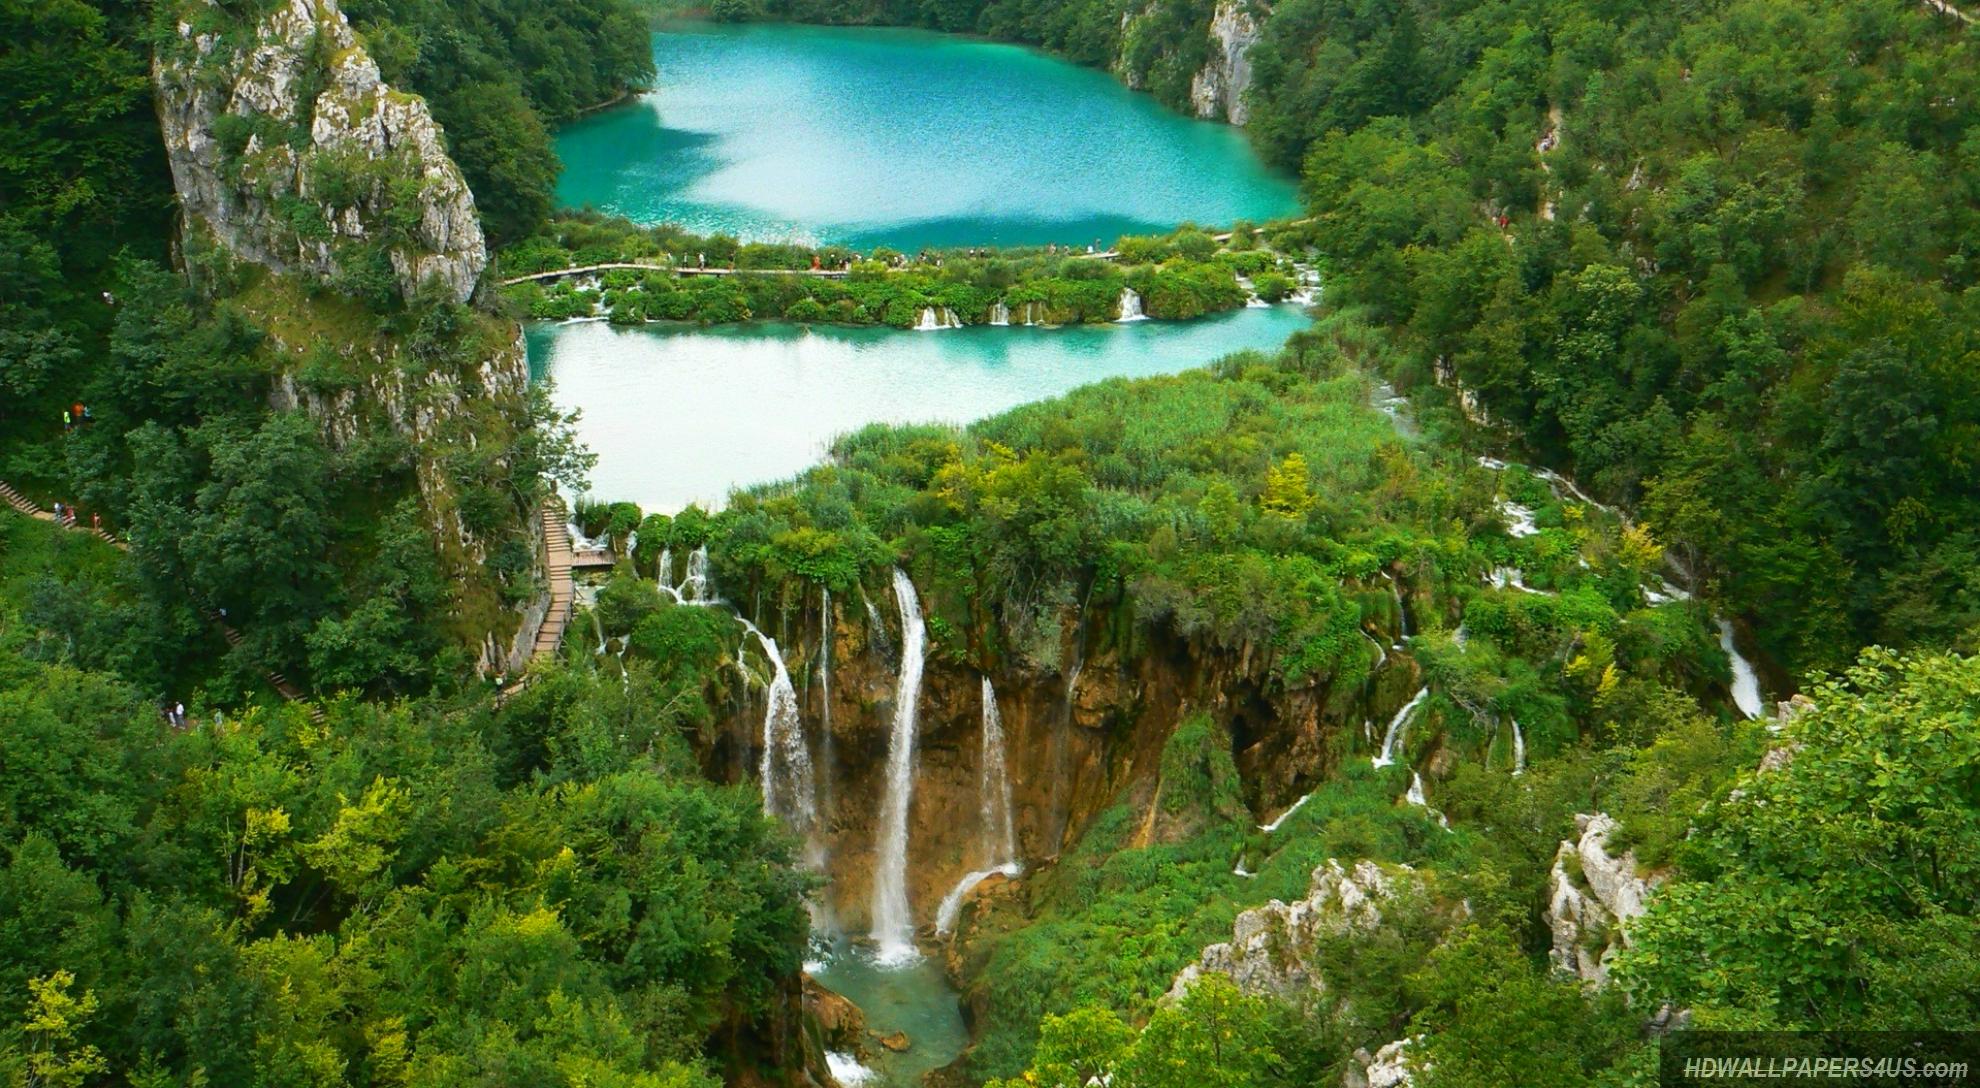 Hd Nature Wallpaper For Android Free Download - Terme Di Santo Stefano Croazia , HD Wallpaper & Backgrounds